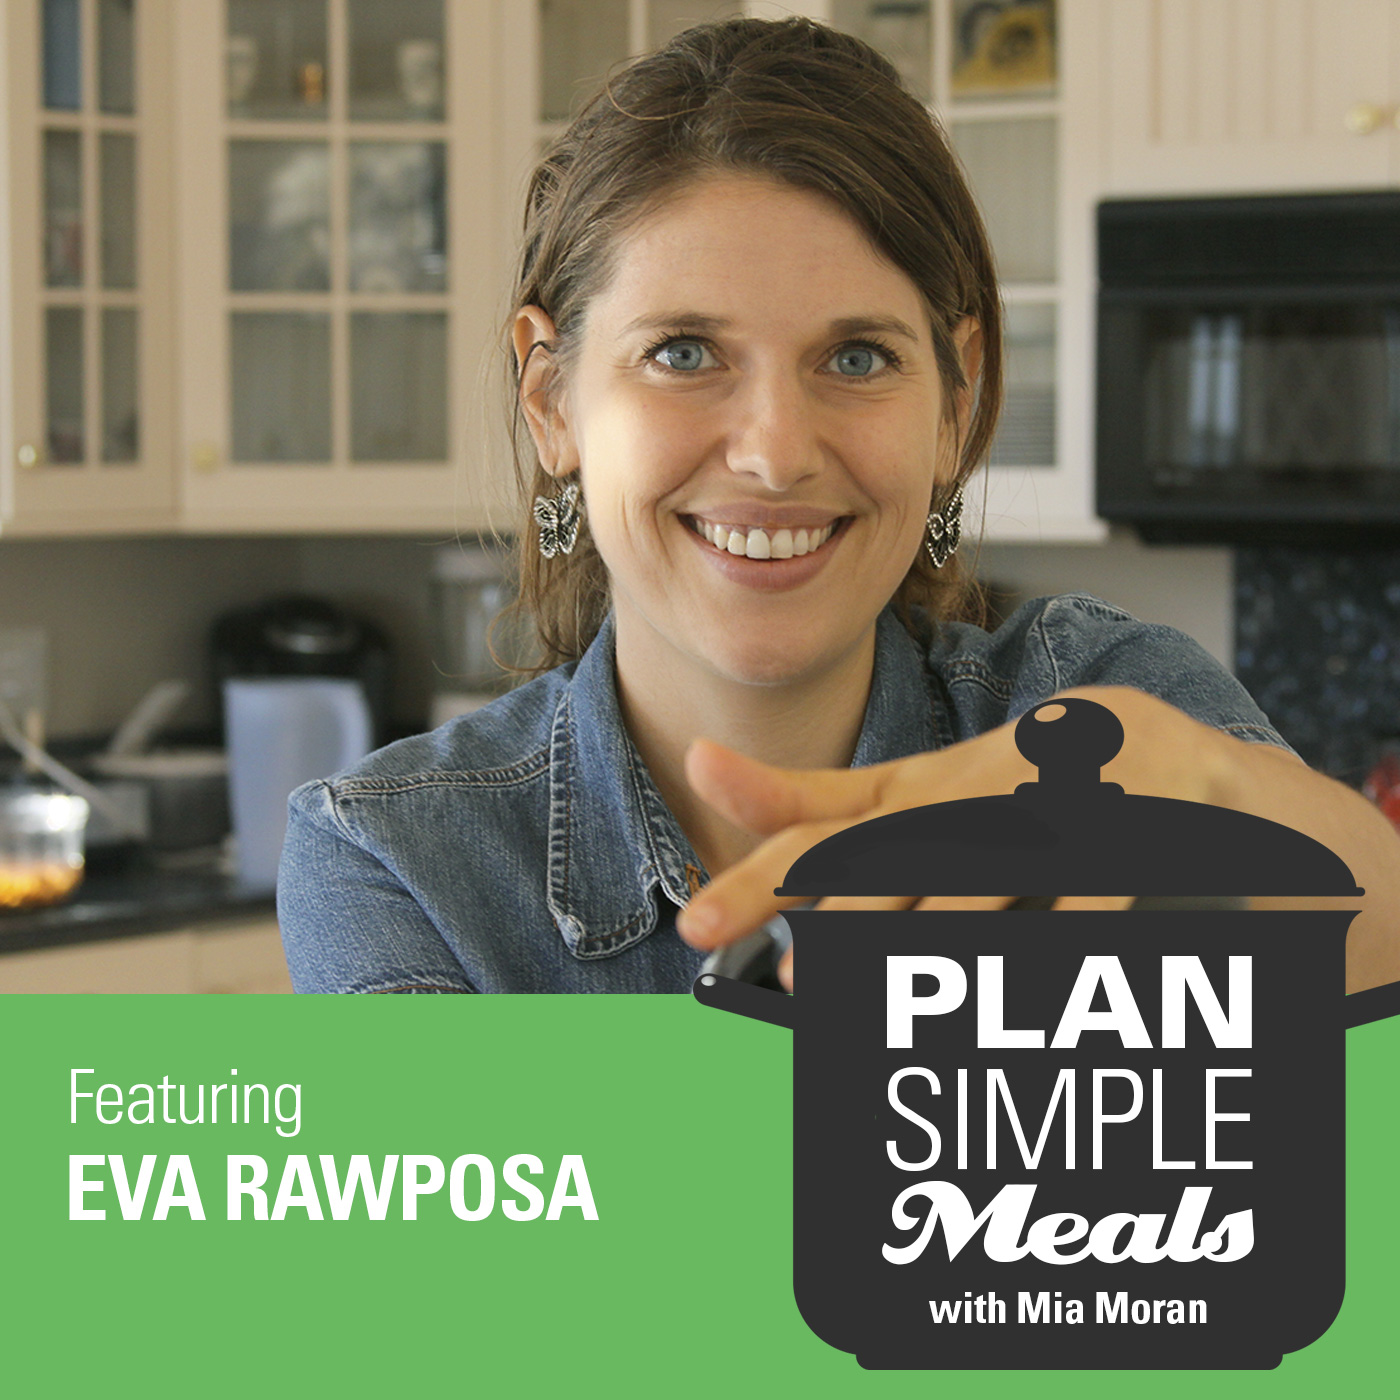 Incorporating Raw Foods With Eva Rawposa